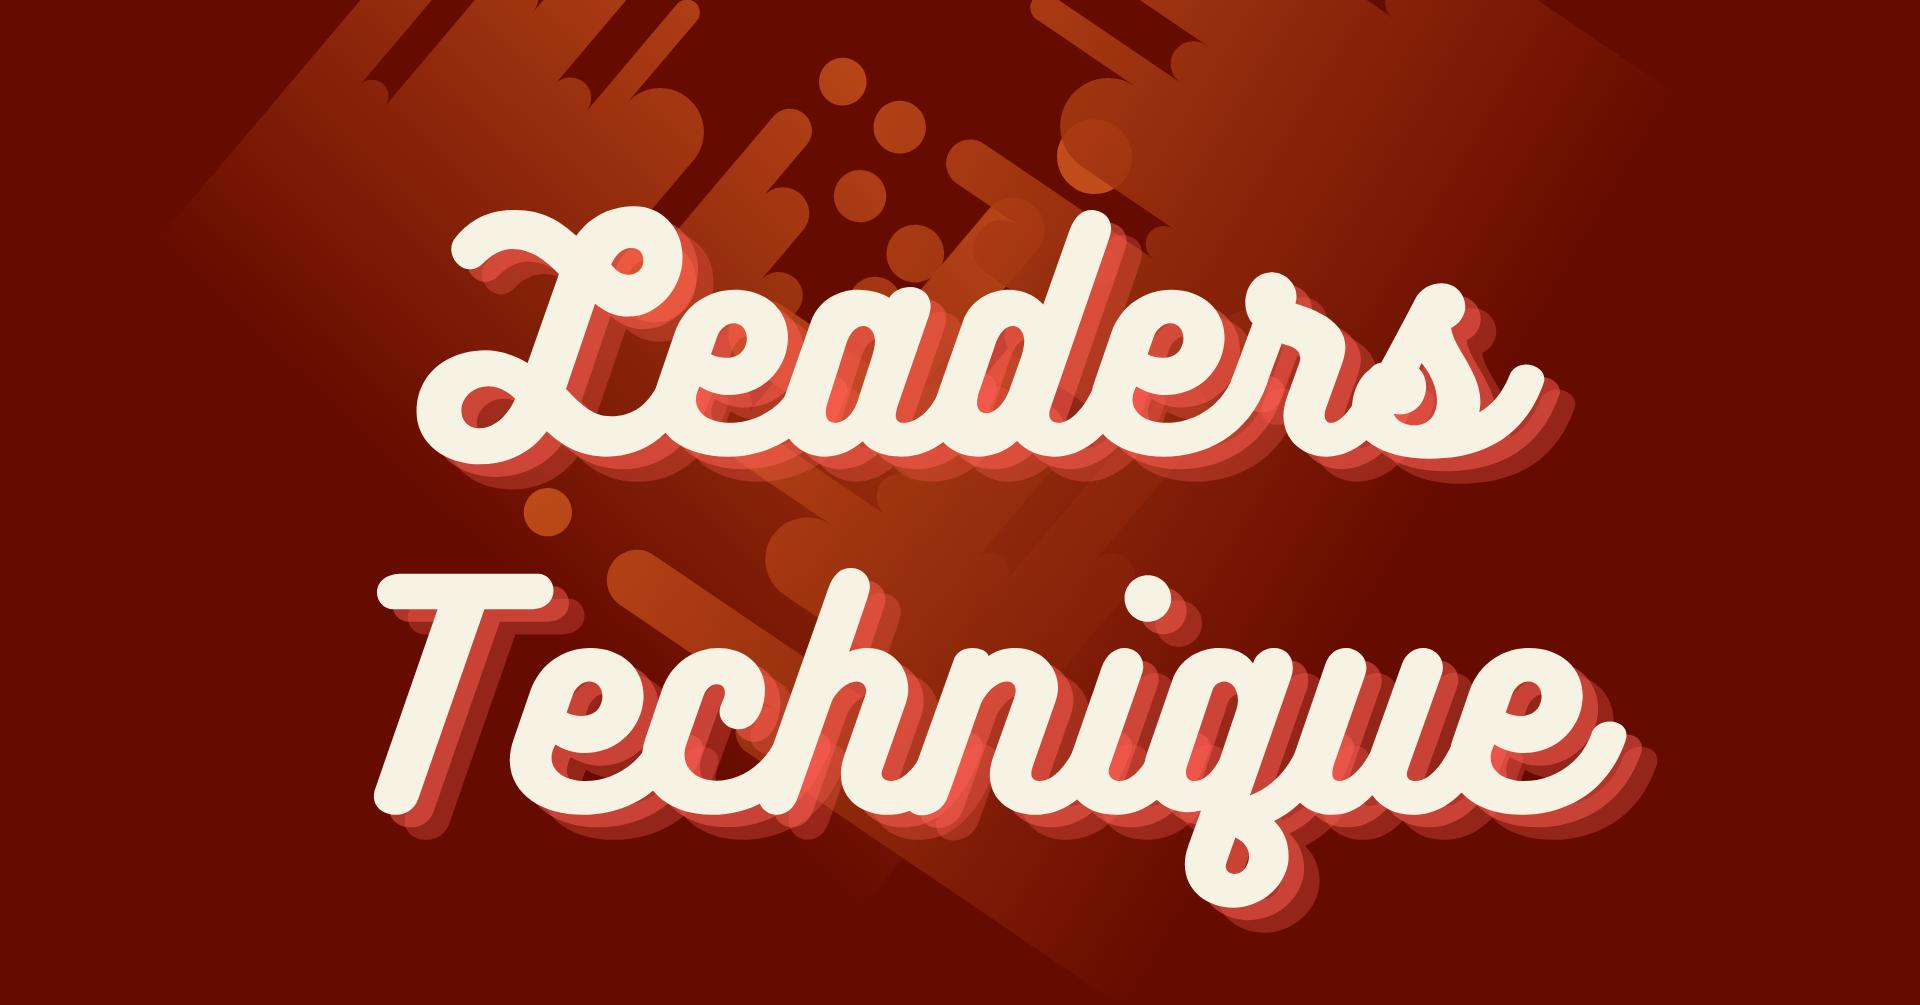 Leaders Technique